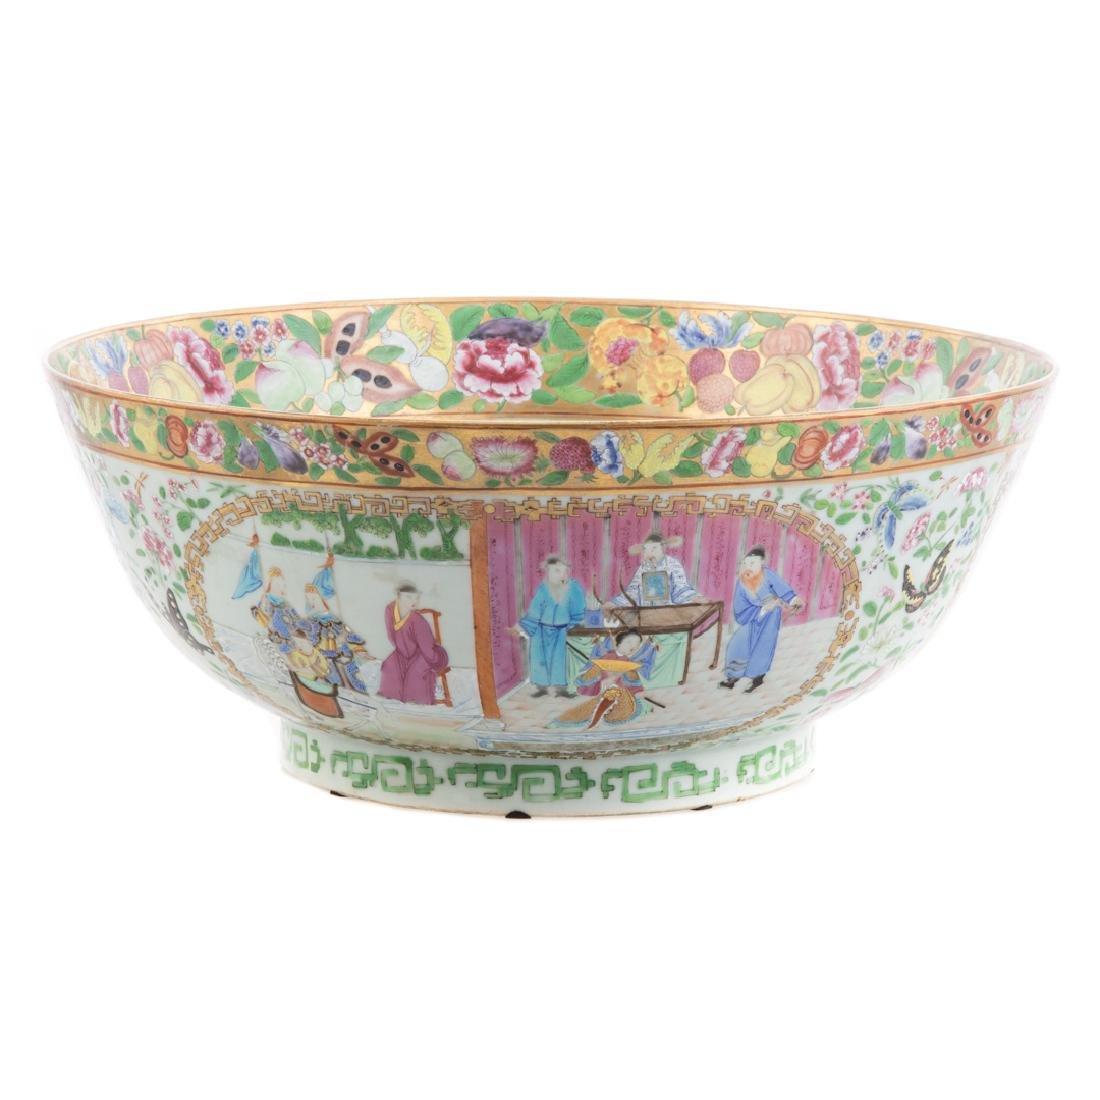 Rare Chinese Export Rose Mandarin punch bowl